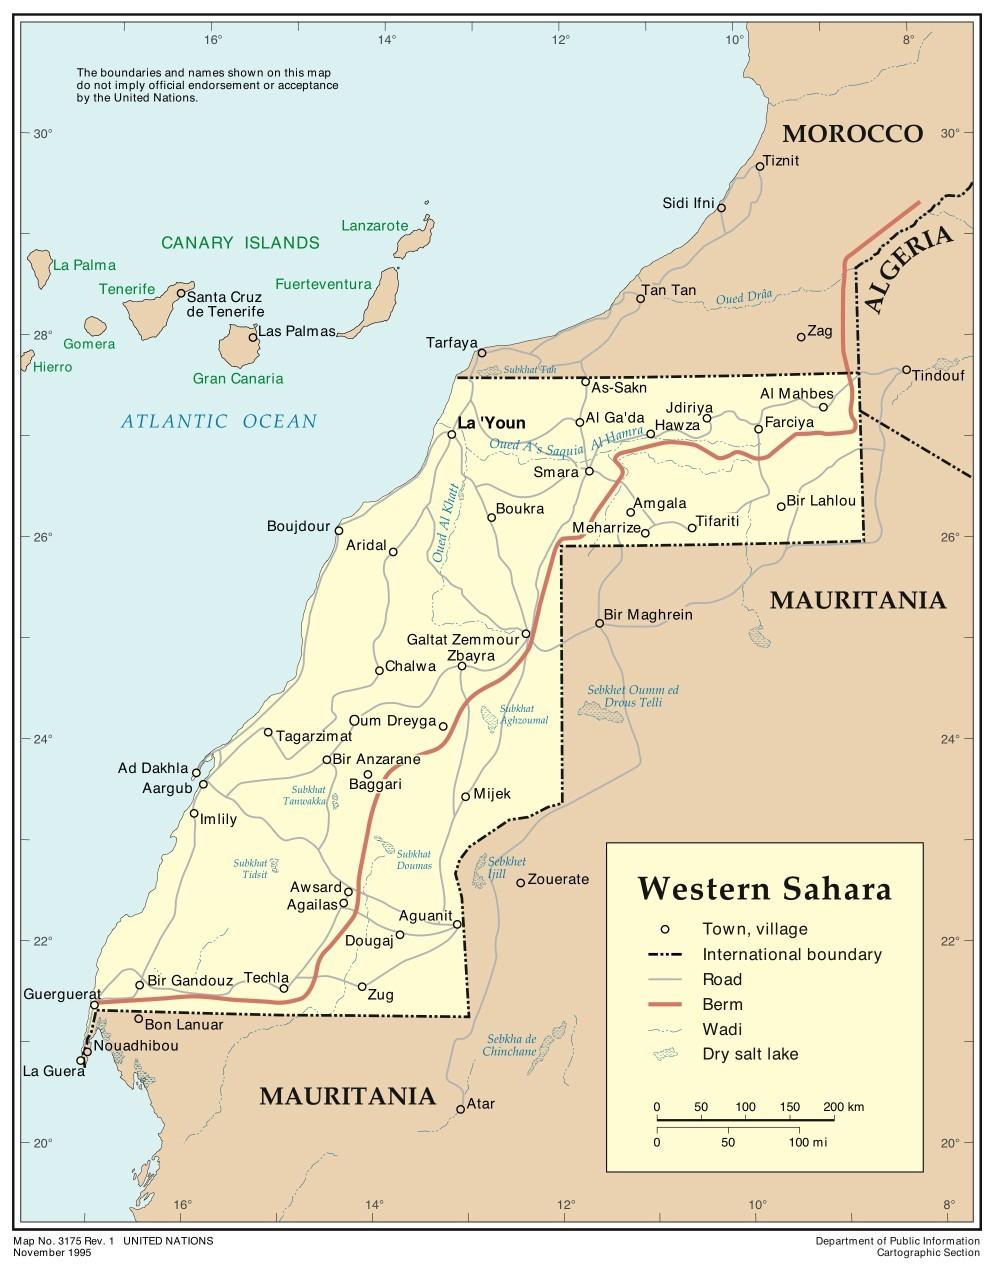 Western Sahara Map Western Sahara Africa Mappery - Western sahara map